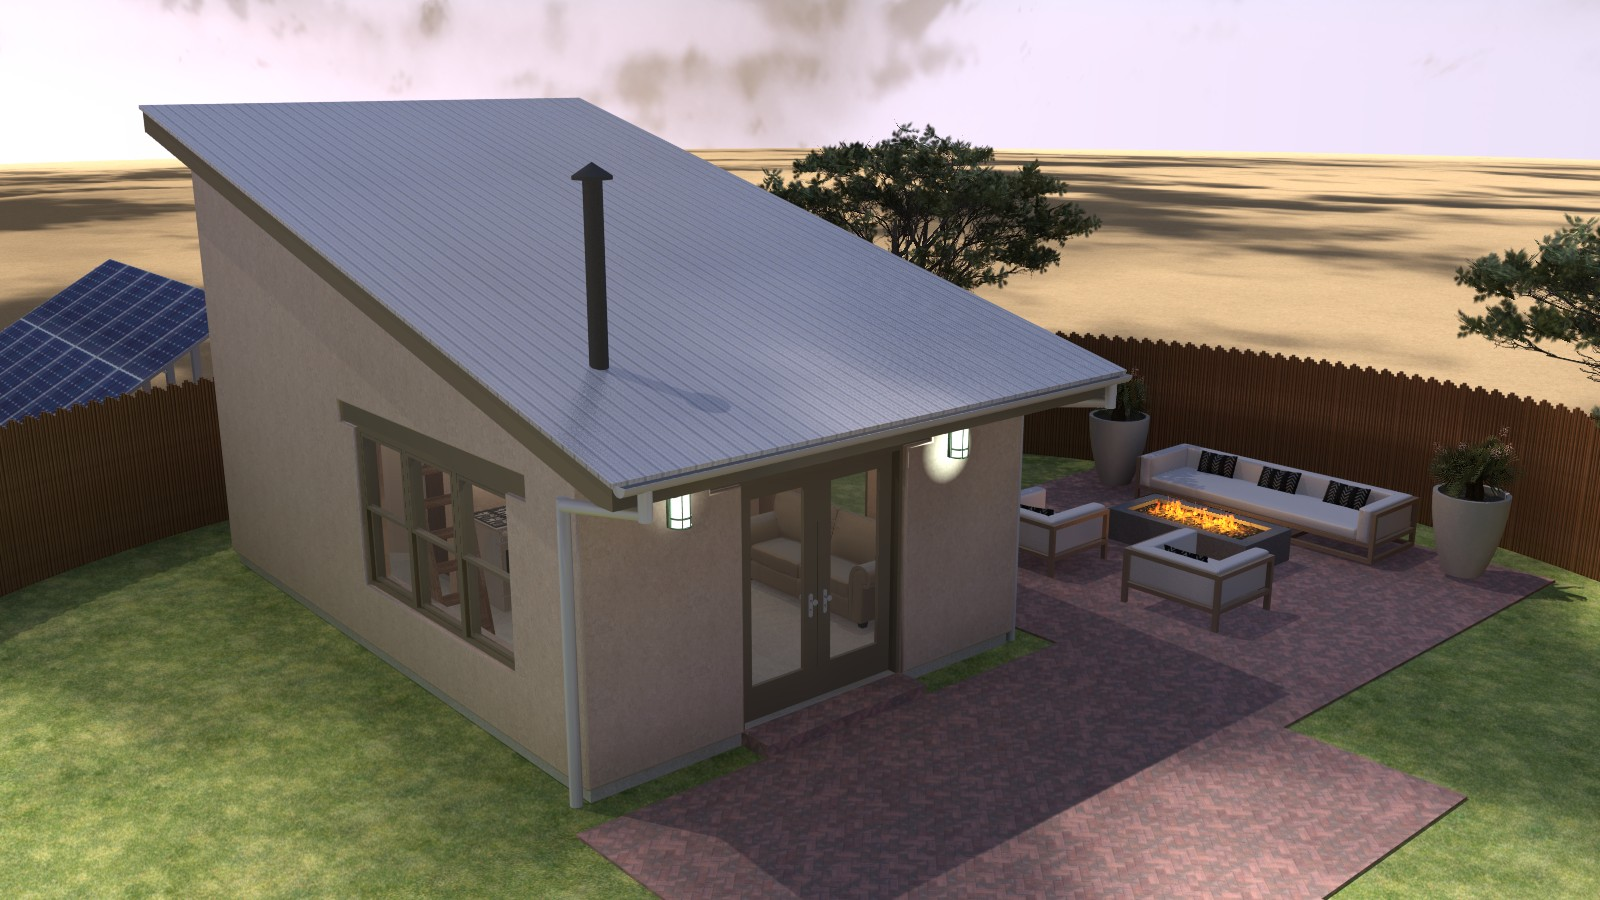 Taos Mesa Day Dream #3 – Micro Adobe Home